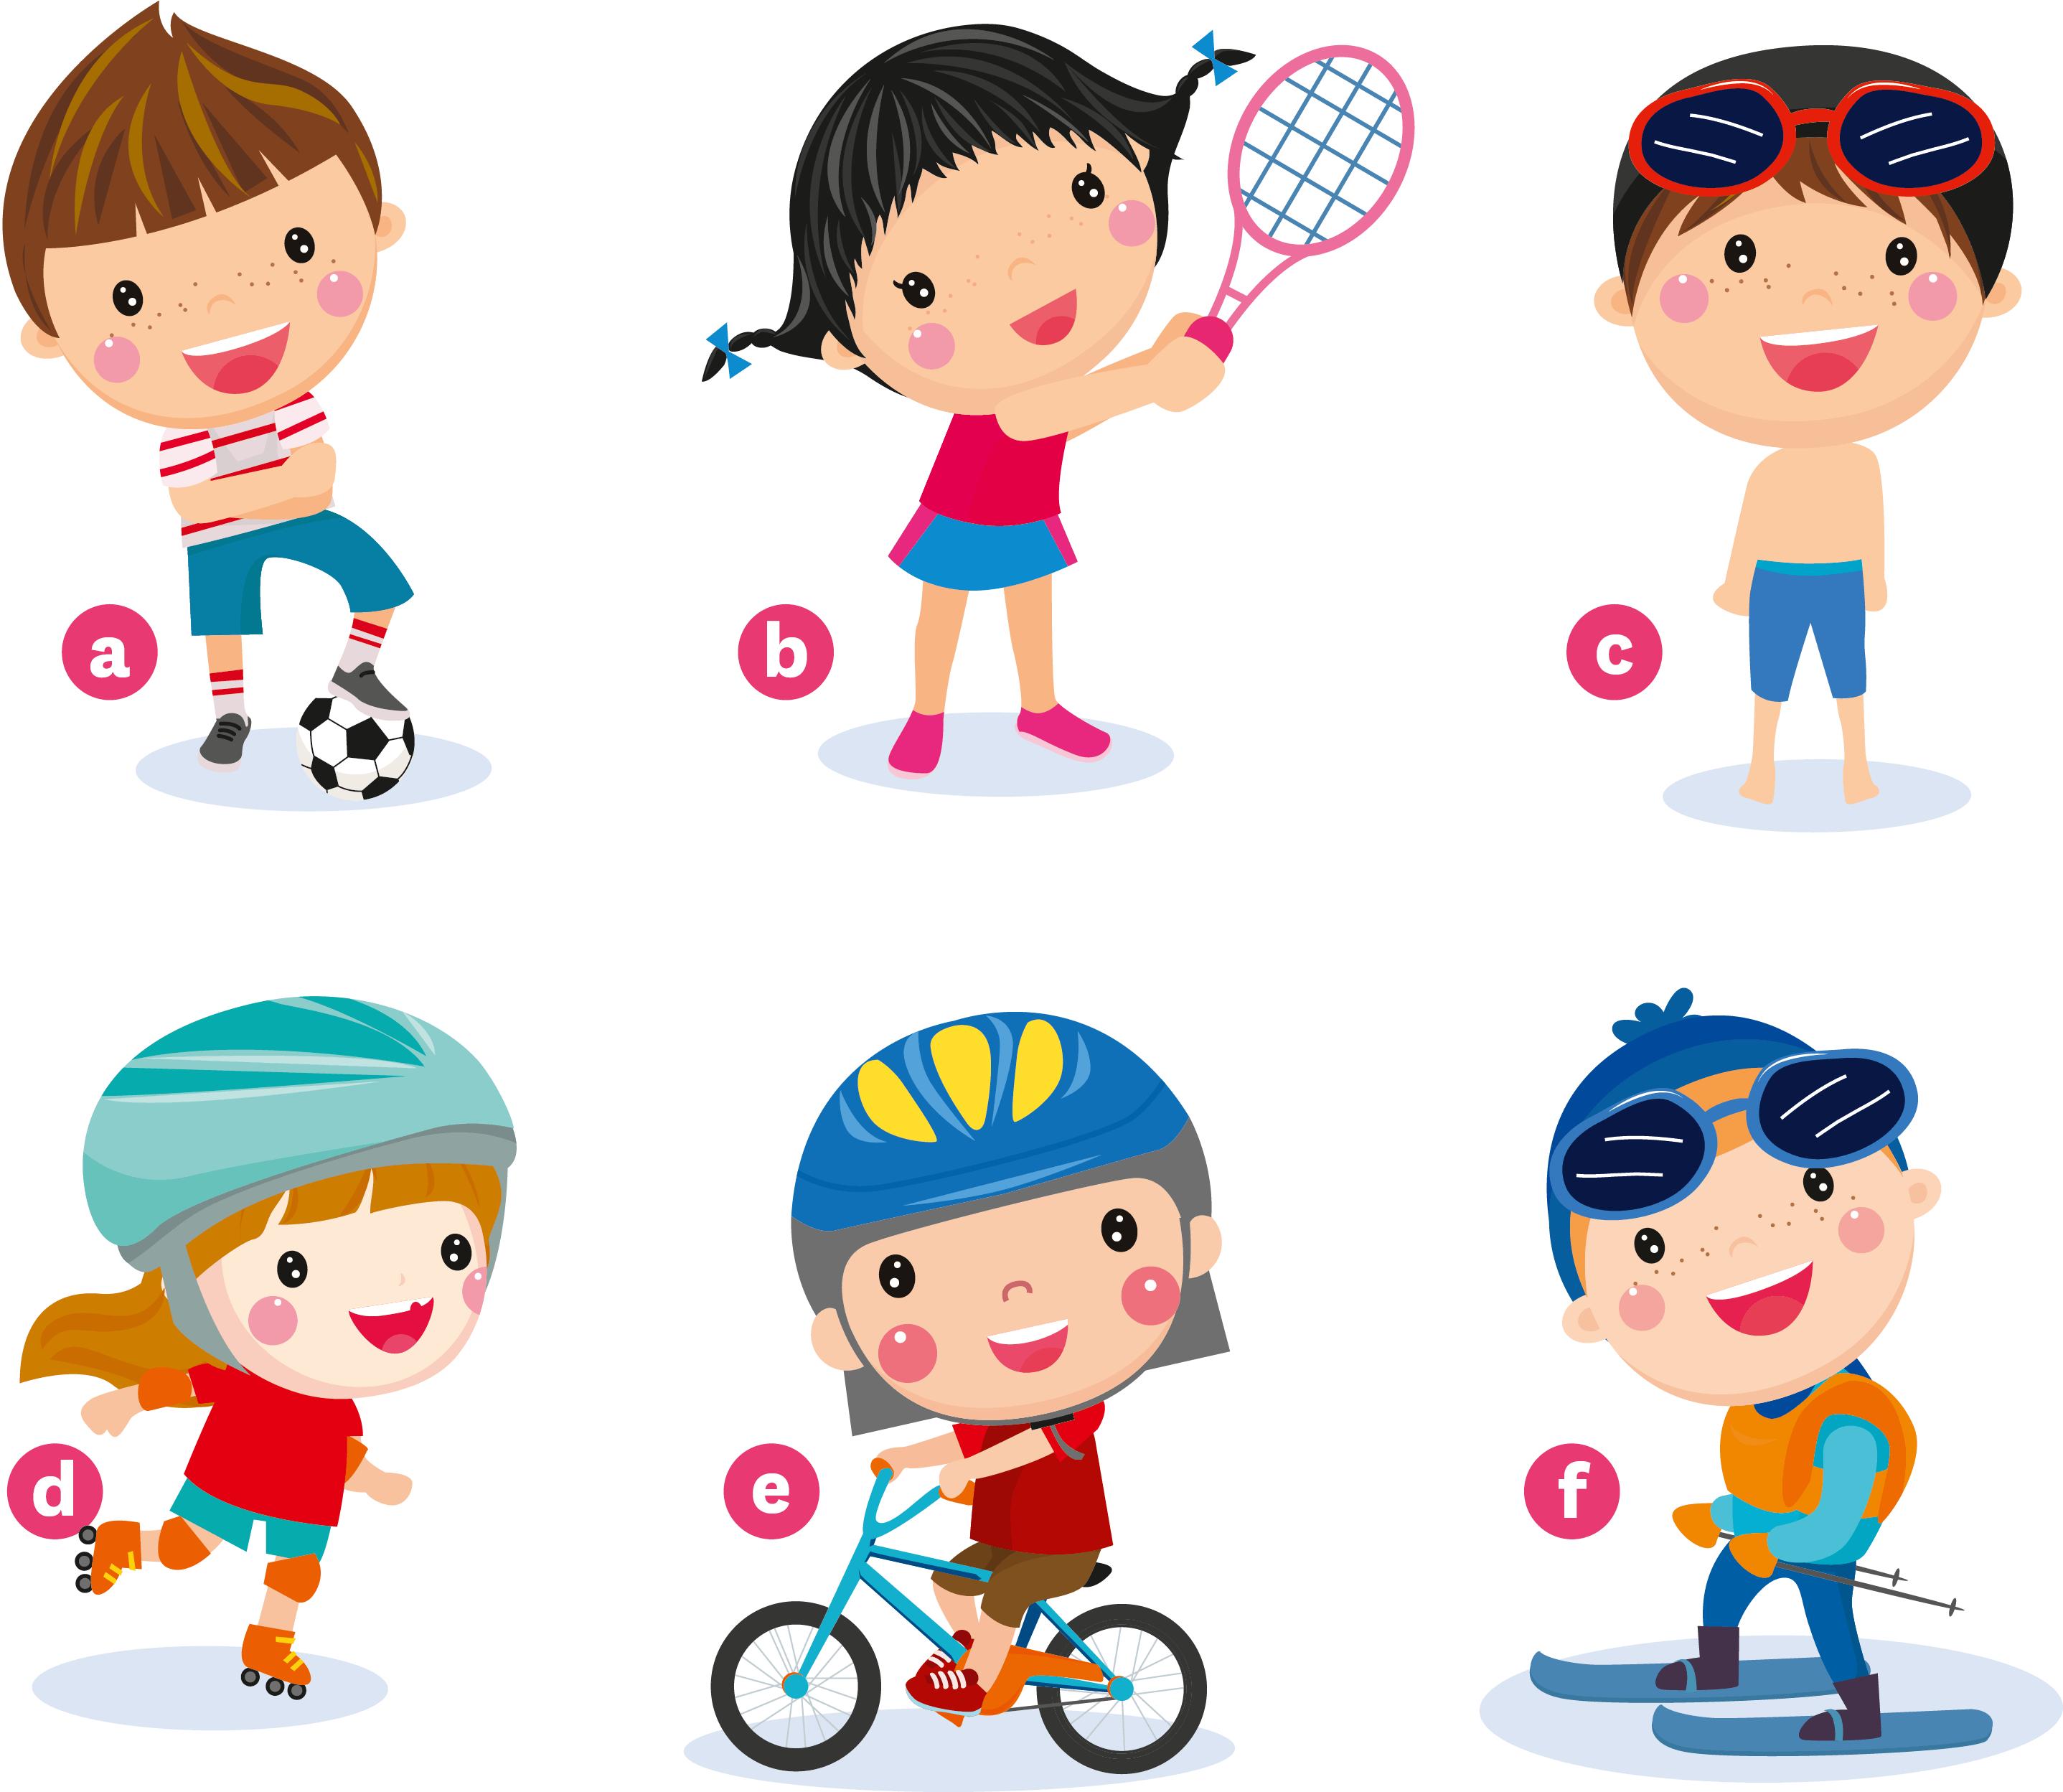 ang6-wb-chap04-enfants-sports